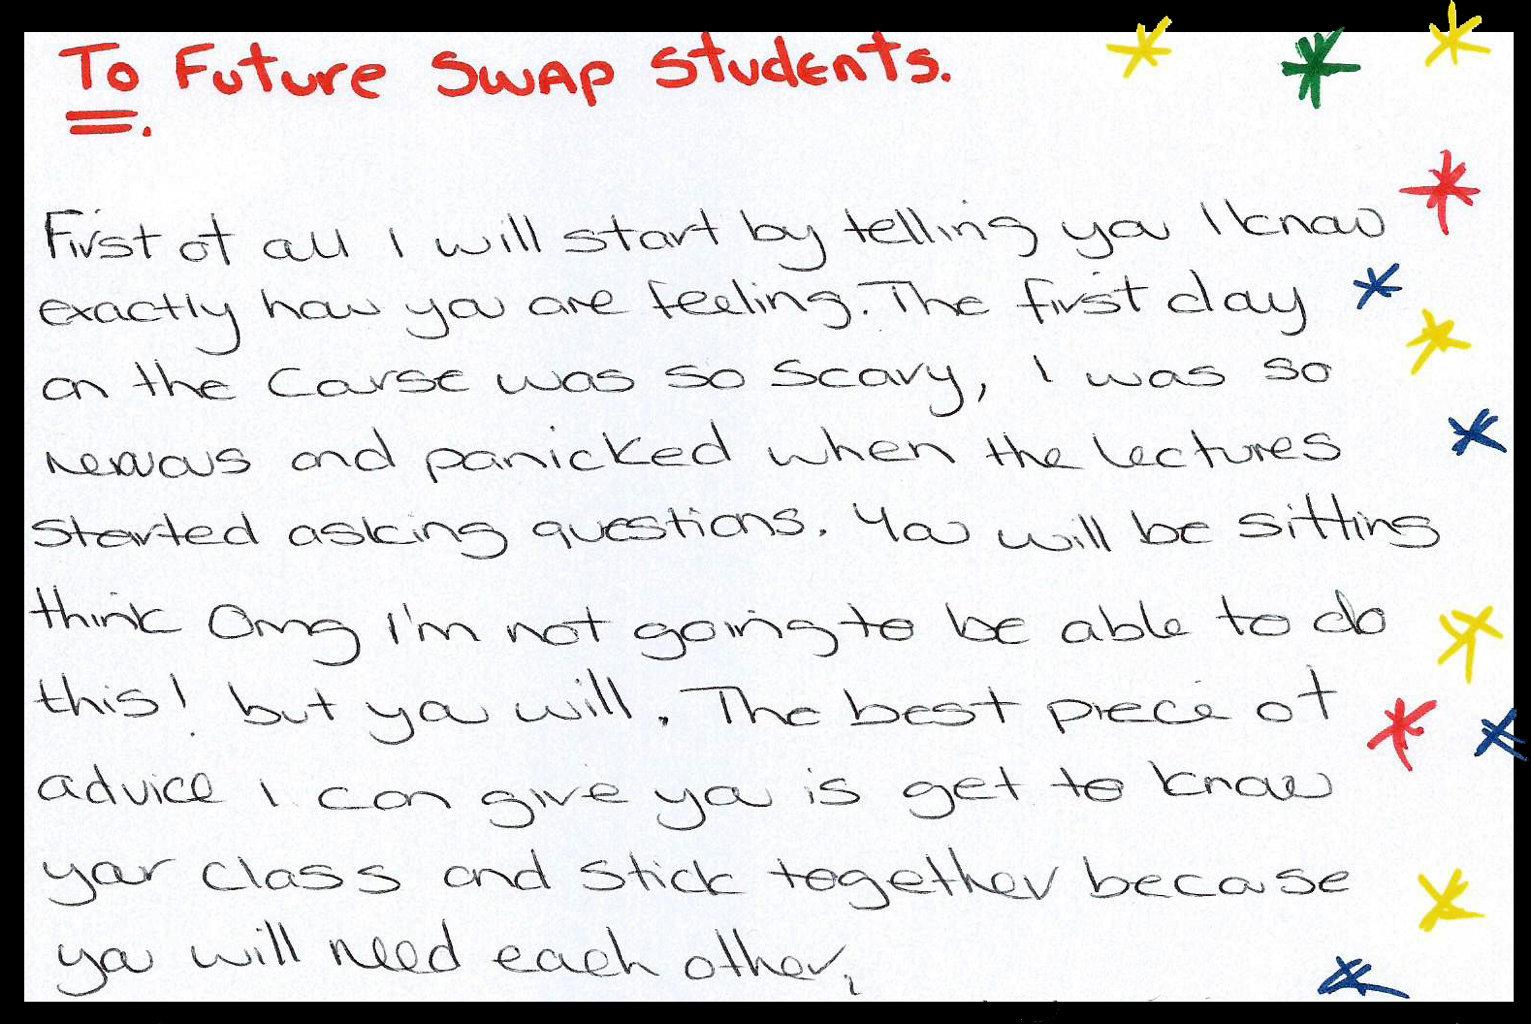 <kilmarnock_college_letter_excerpt2.jpg>